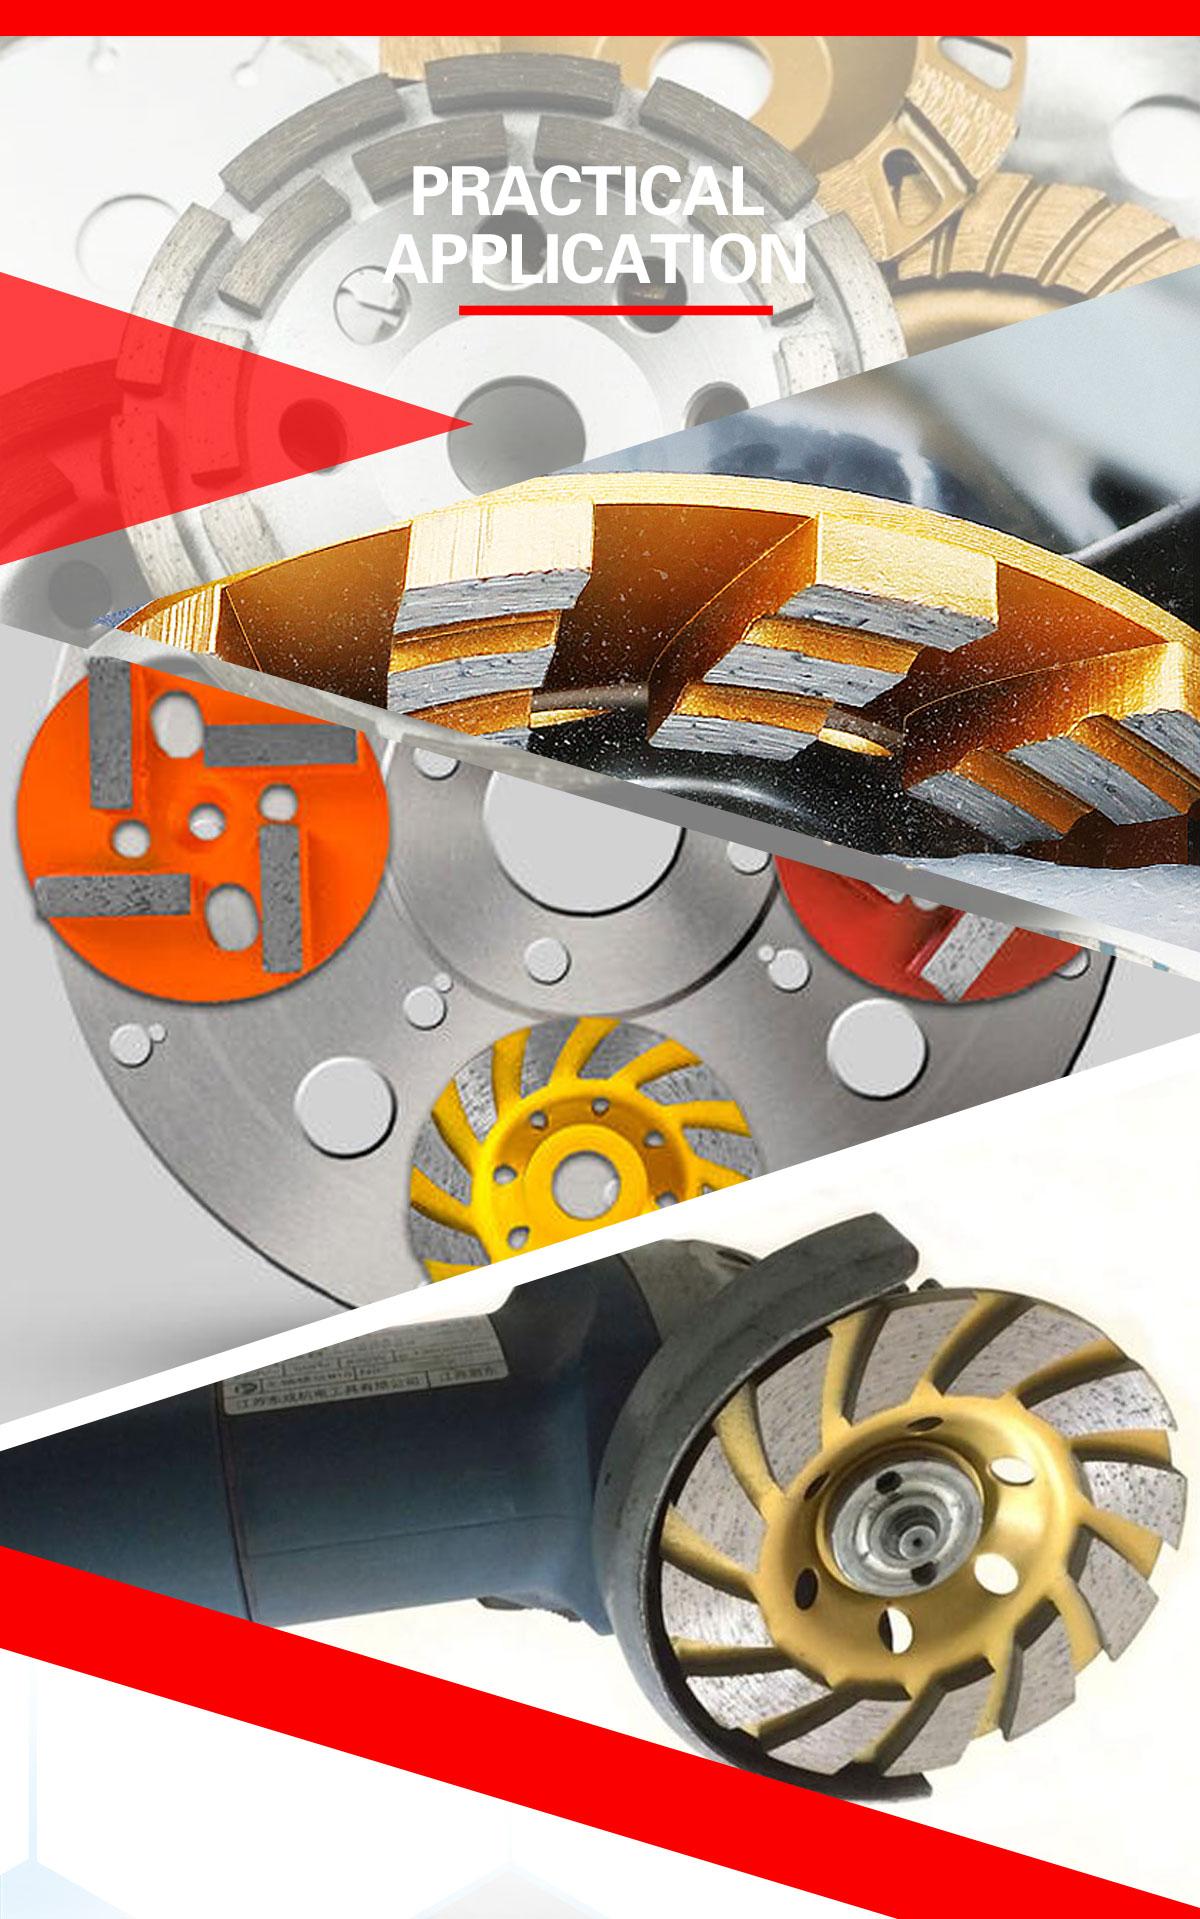 stone grinding wheel, diamond grinding wheels